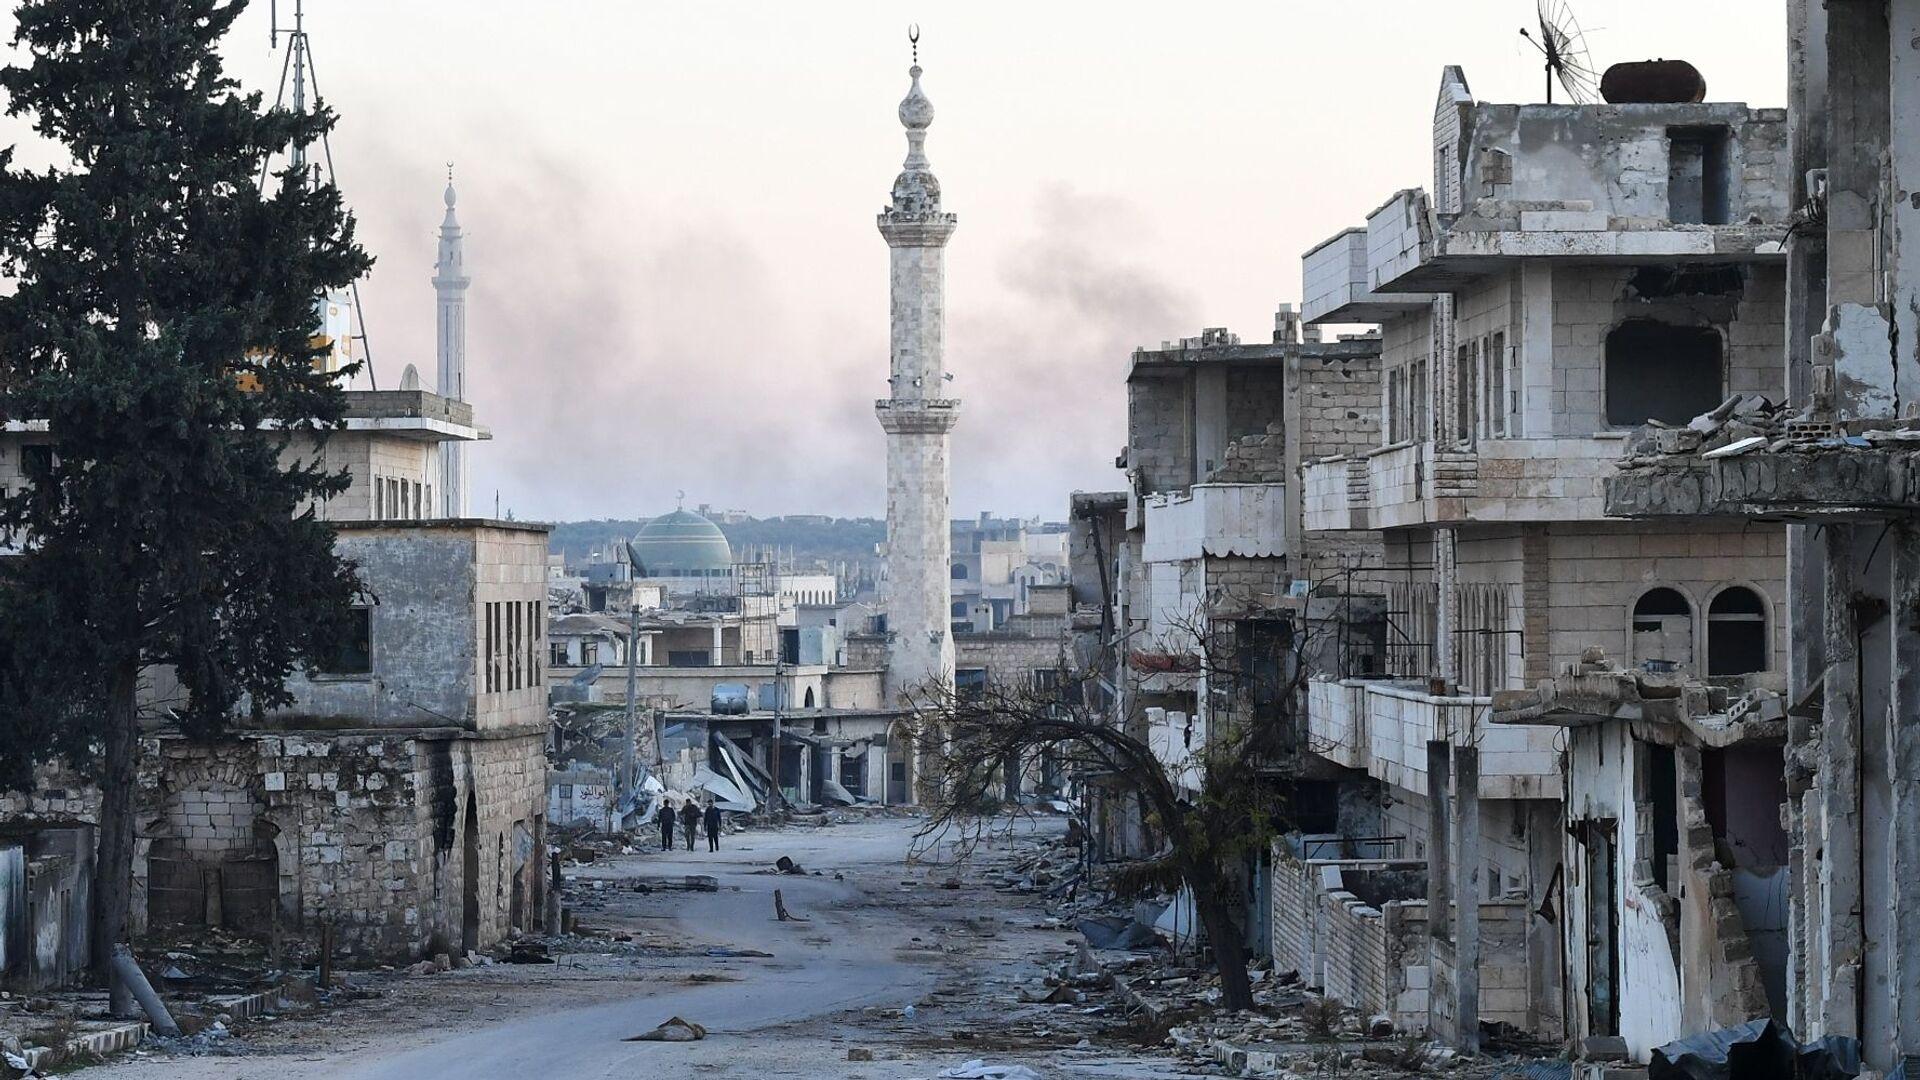 Provincia di Idlib, Siria. - Sputnik Italia, 1920, 20.09.2021